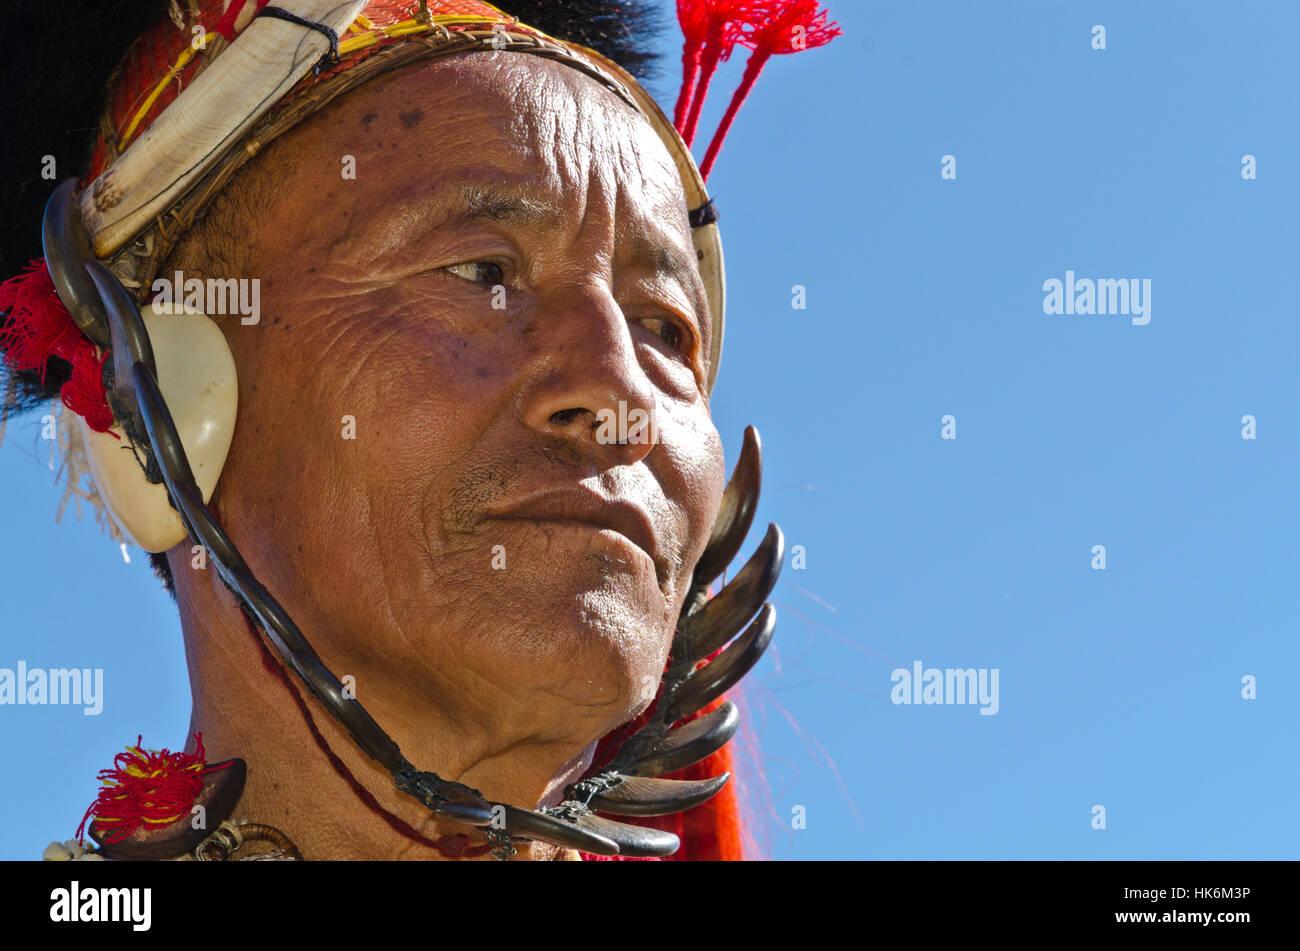 Khamnungma-Warrior fully decorated at Hornbill-Festival Stock Photo